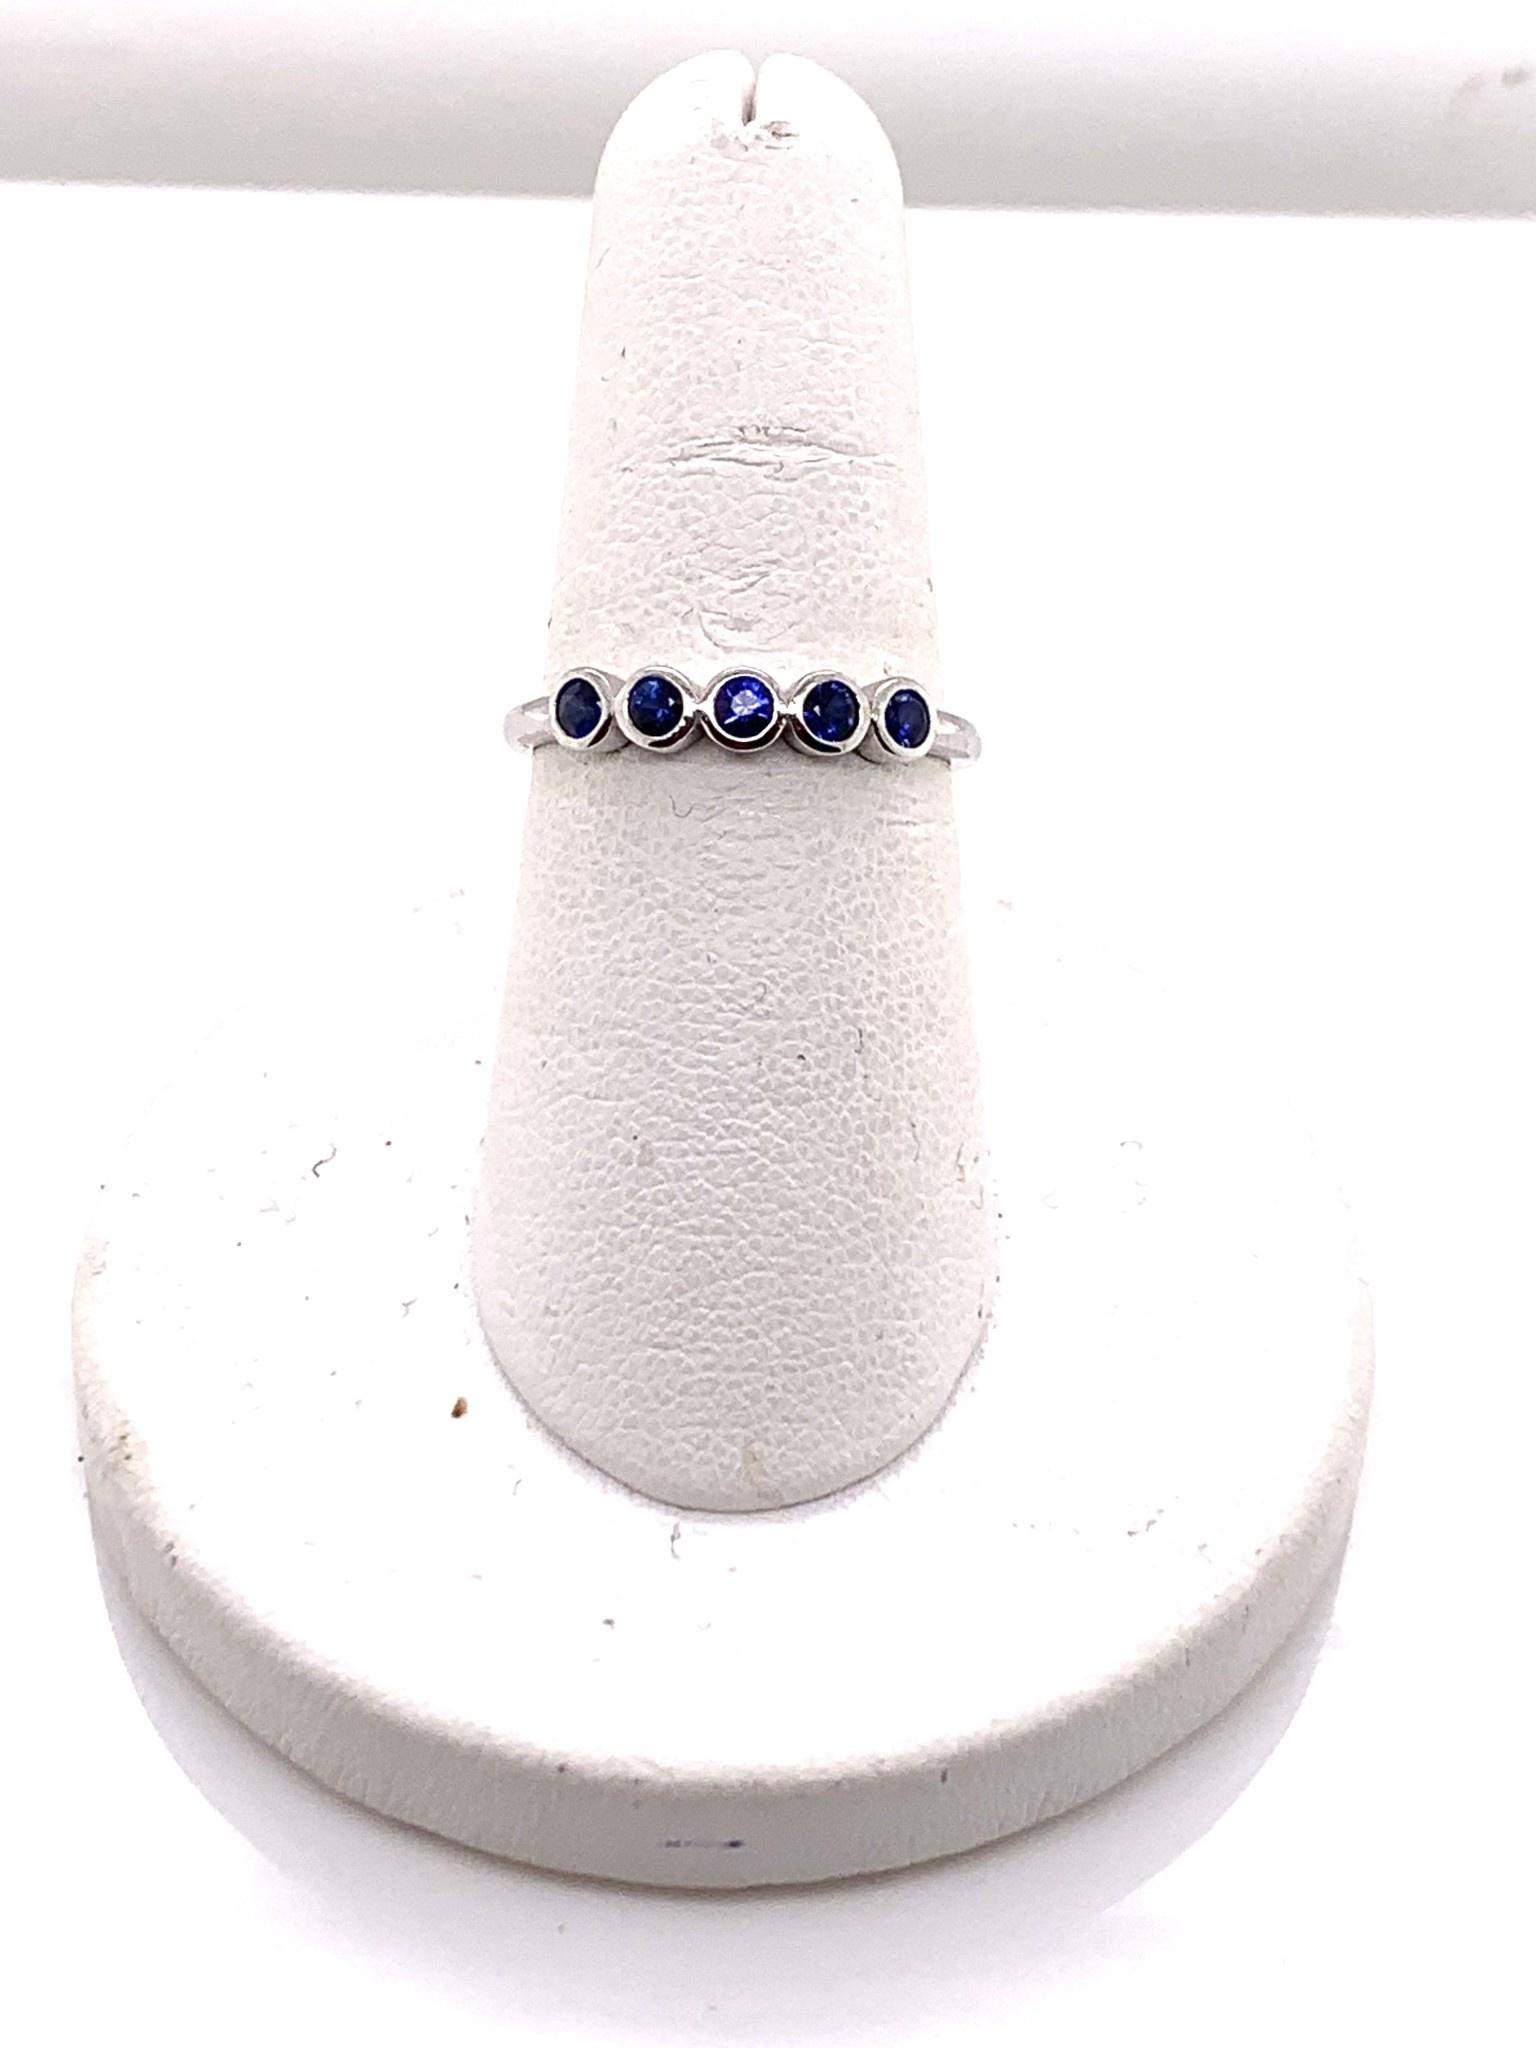 14K white gold 5-sapphire bezel set band size 6.75